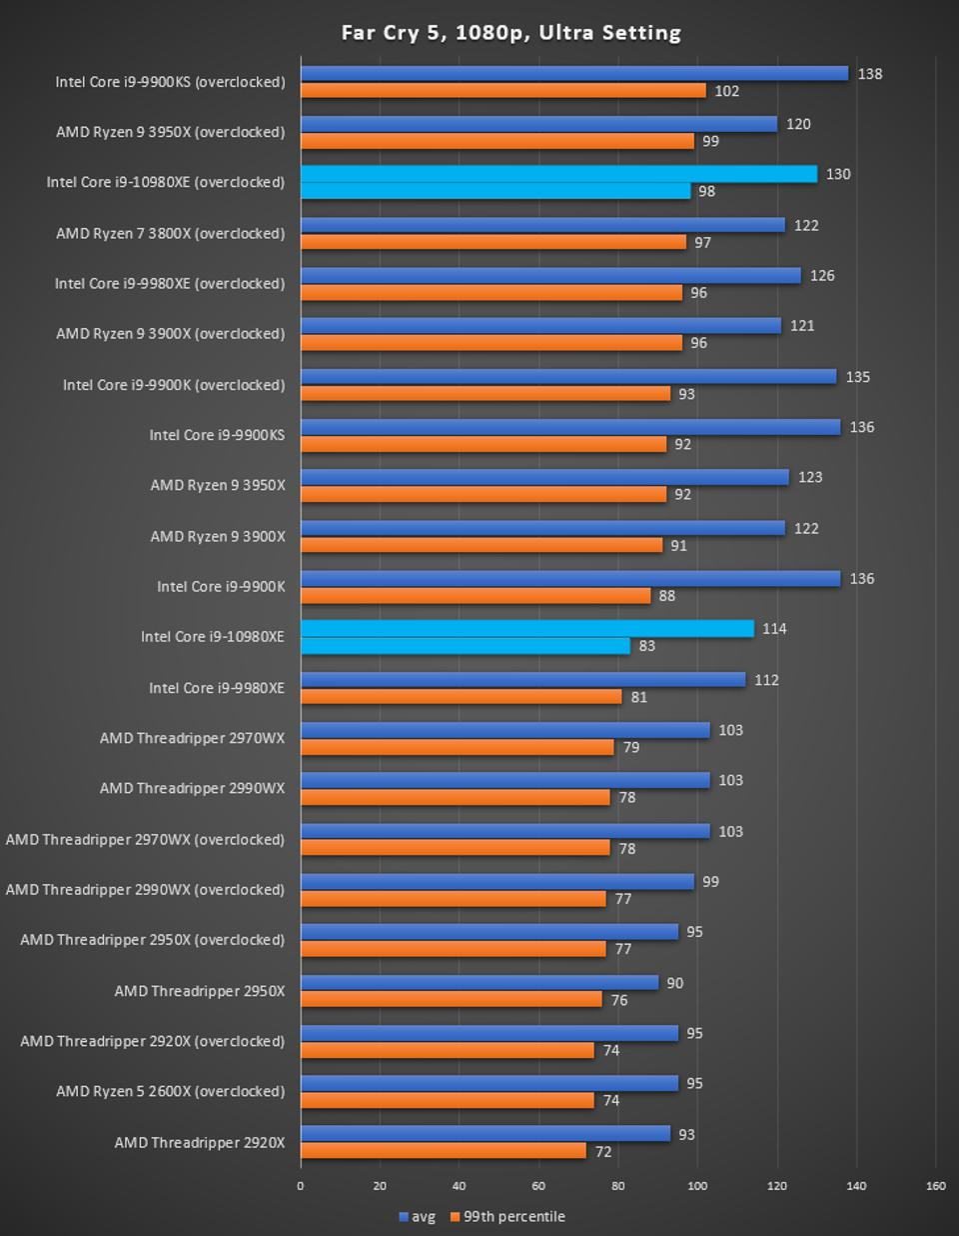 Intel Core i9-10980XE Far Cry 5 Benchmark